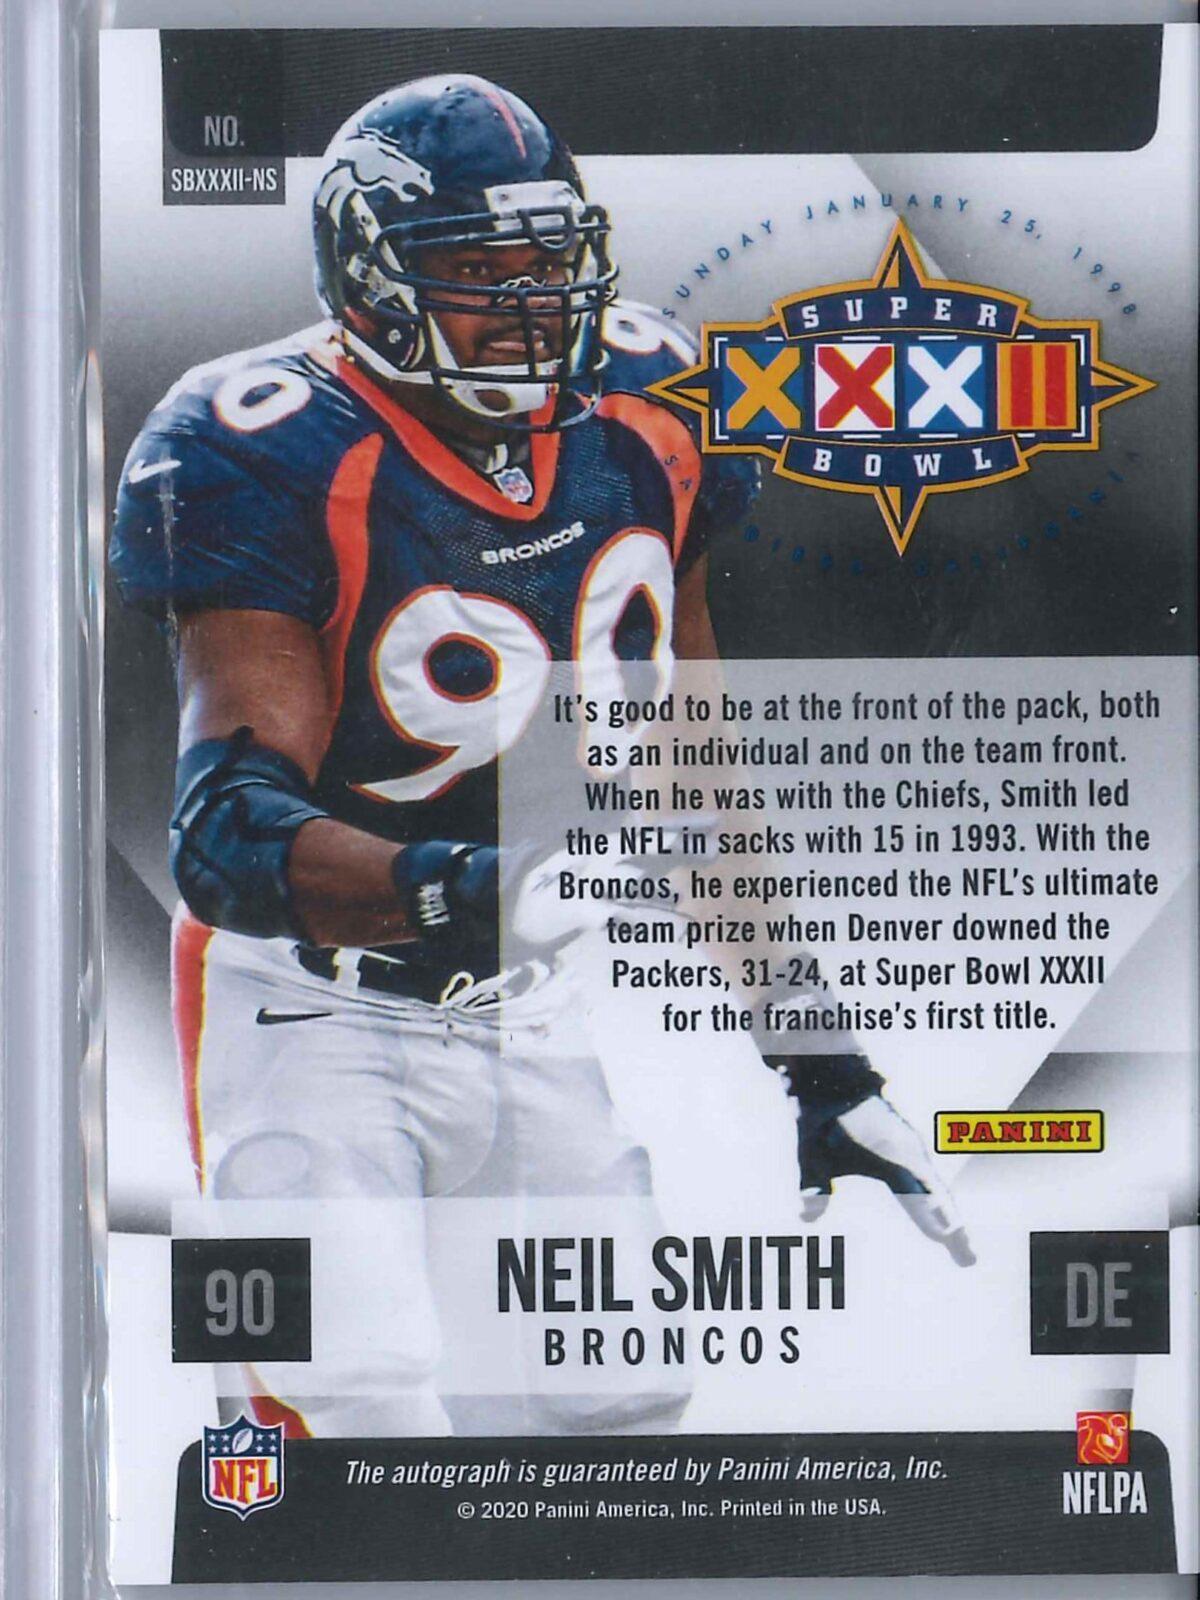 Neil Smith Panini Limited 2020 Auto Holo Super Bowl